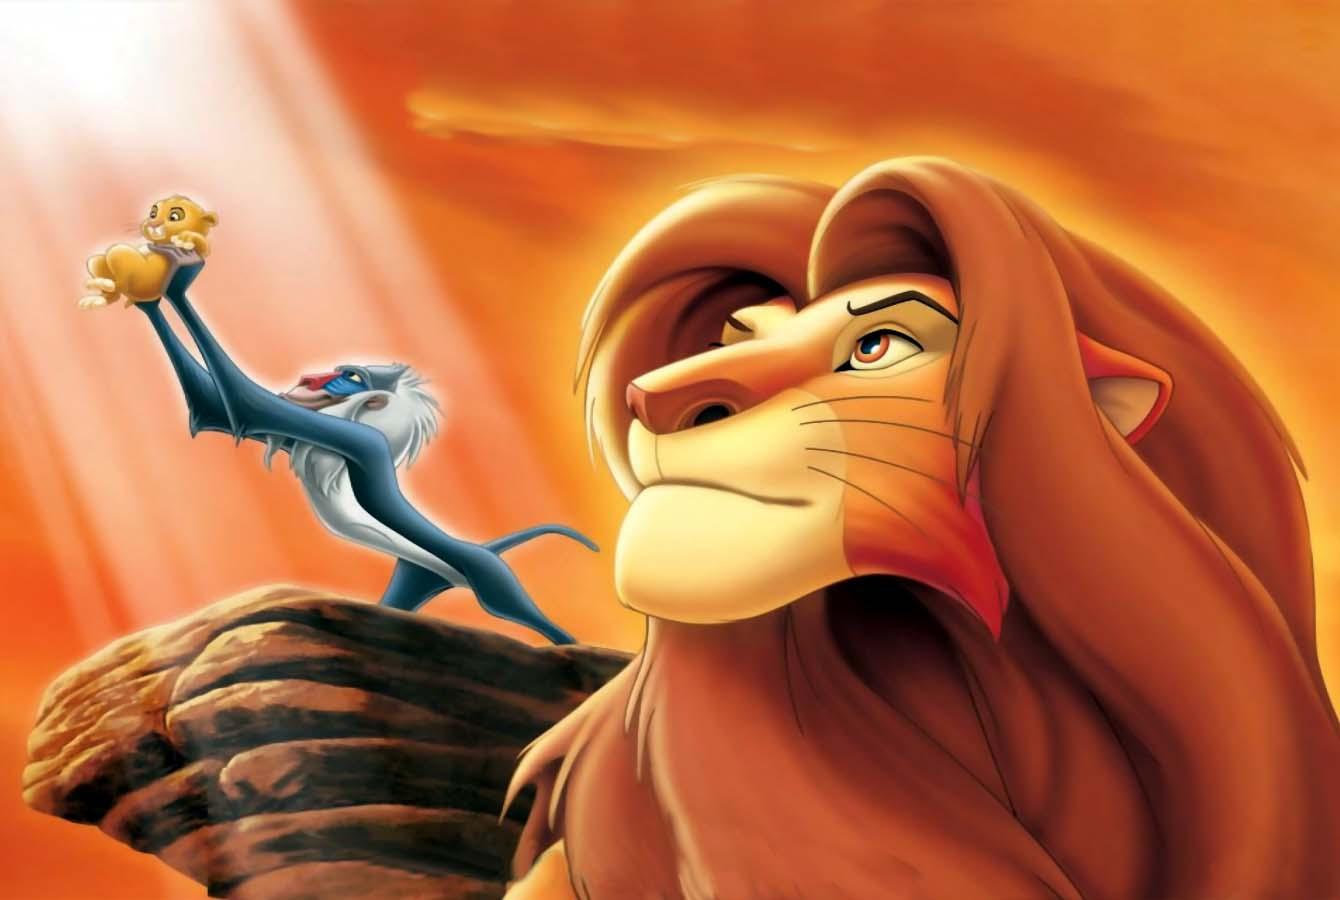 http://2.bp.blogspot.com/-Zwwm7pLaGc8/T9jbqyAaiqI/AAAAAAAAE4M/PfrNB61AcKU/s1600/Walt_disney_lion_king_pictures_for_kids_1.jpg